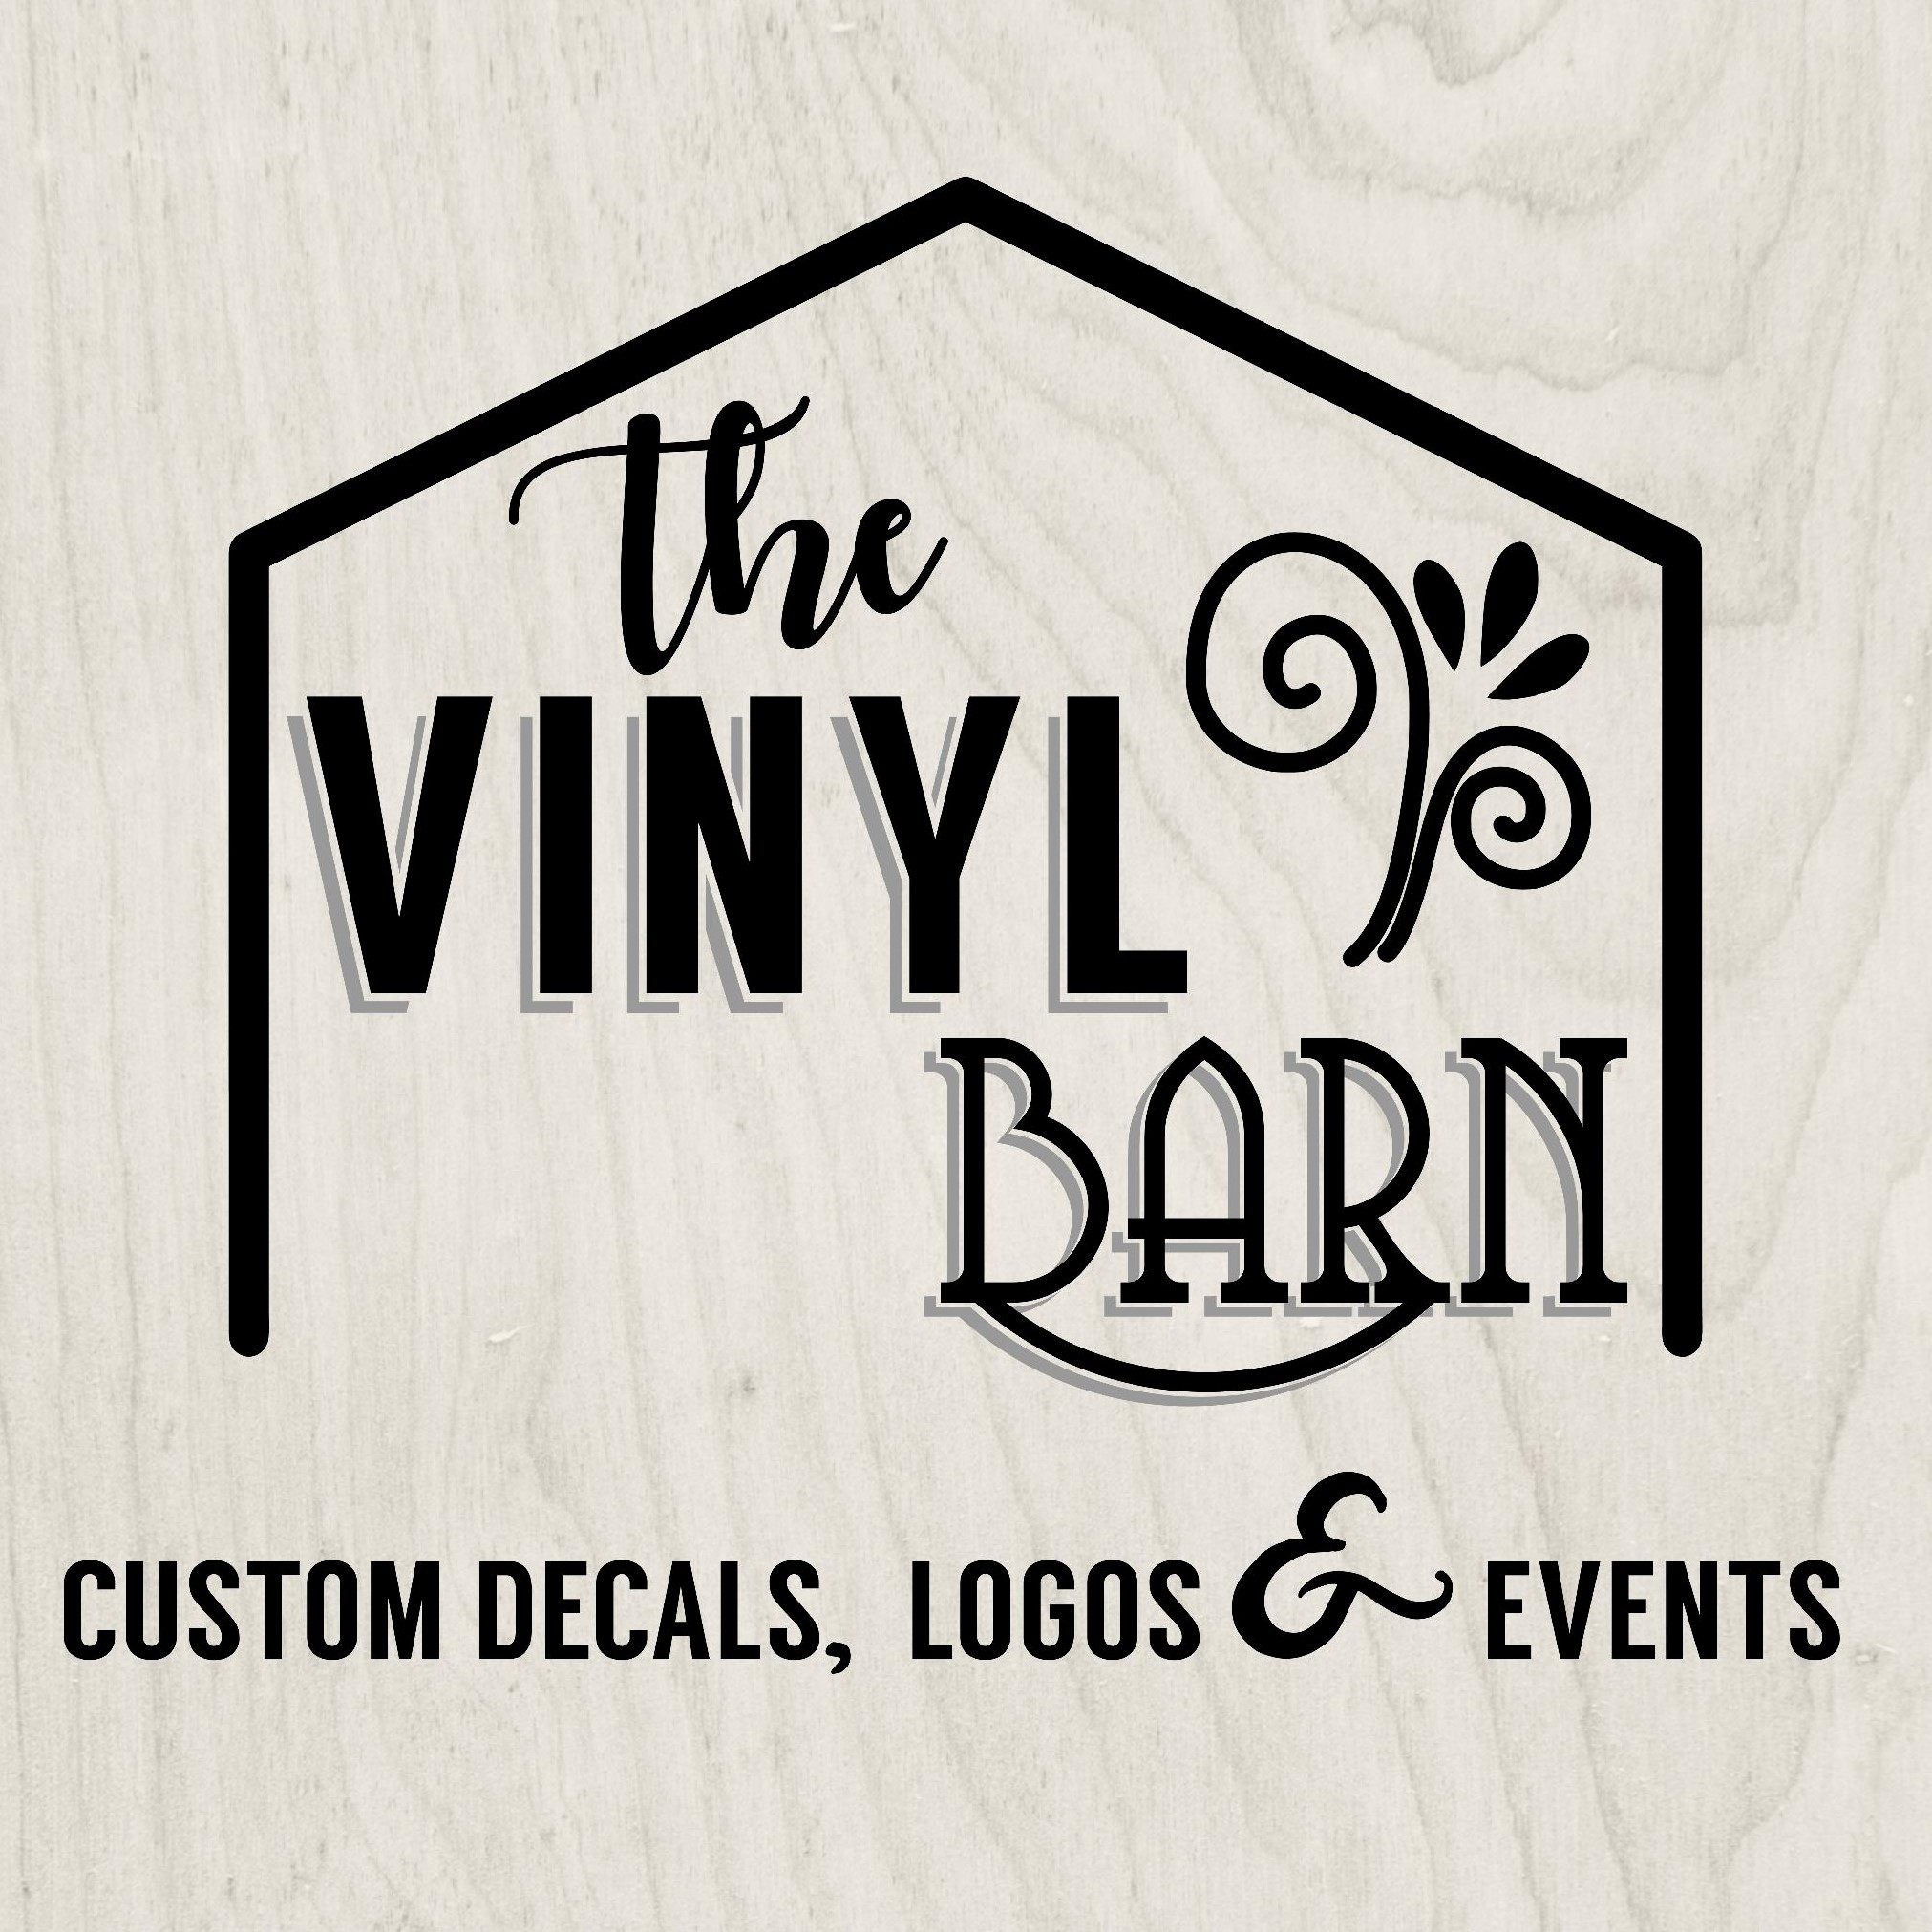 The Vinyl Barn